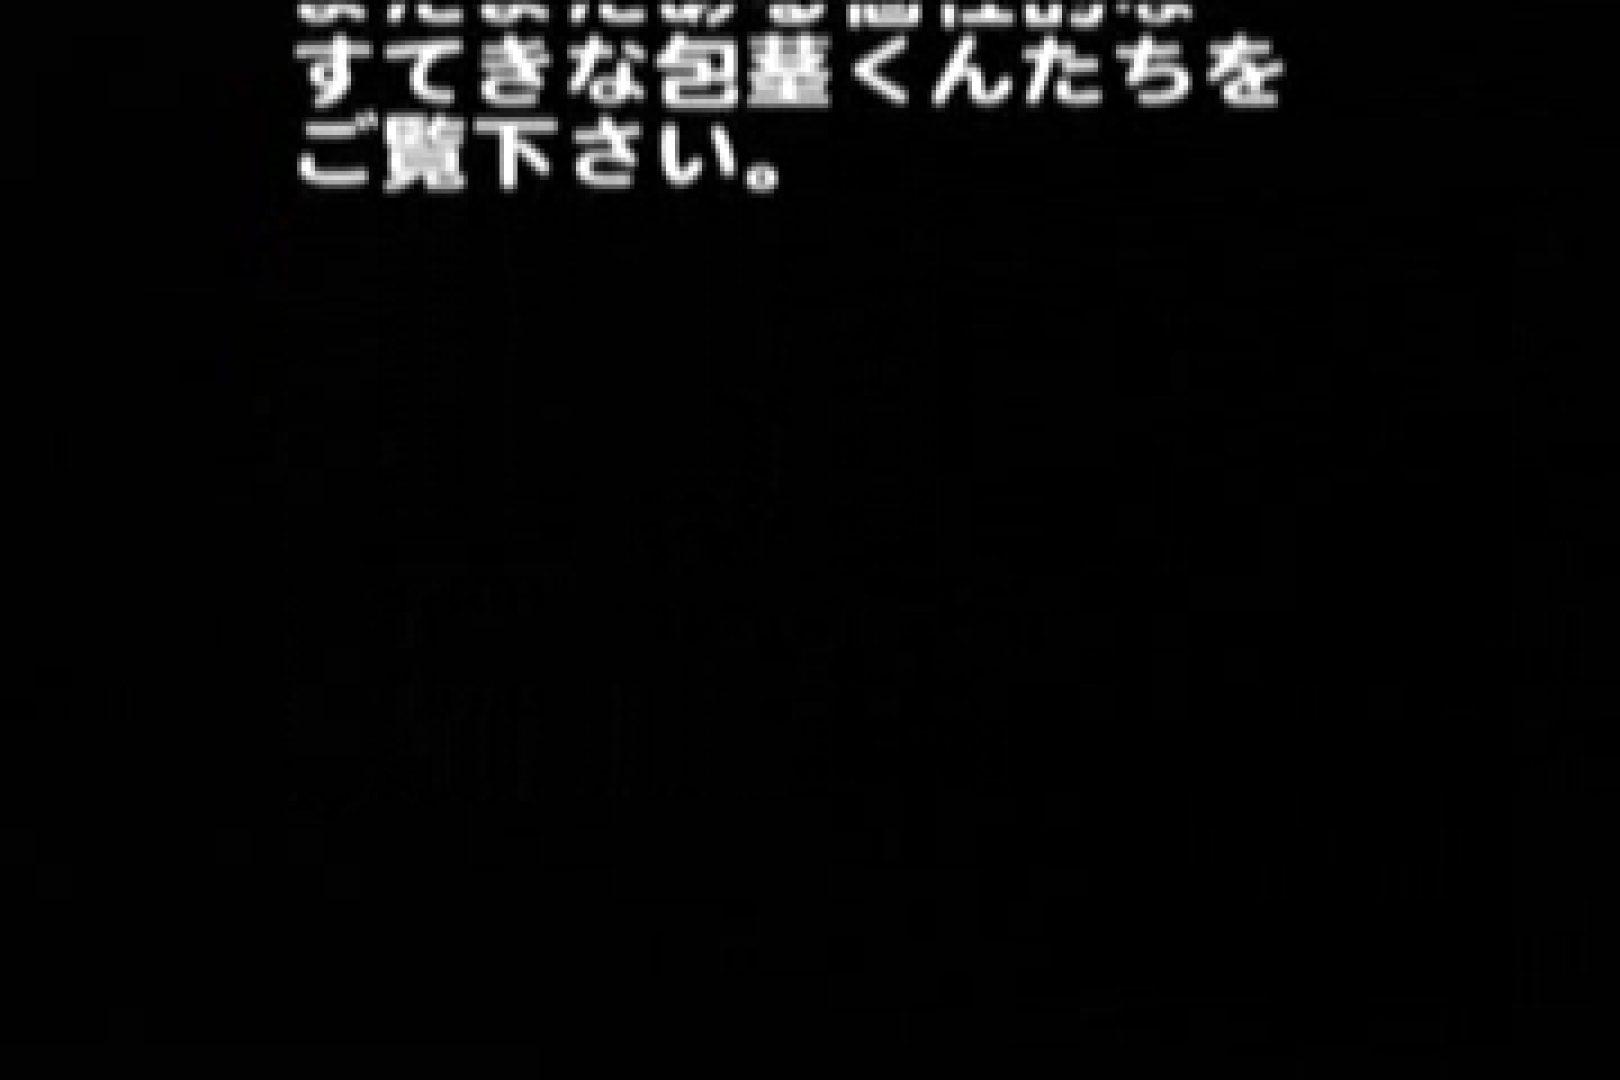 BABY FACEな包茎事情!!4FACEの快楽 フェラ ゲイ素人エロ画像 104枚 3